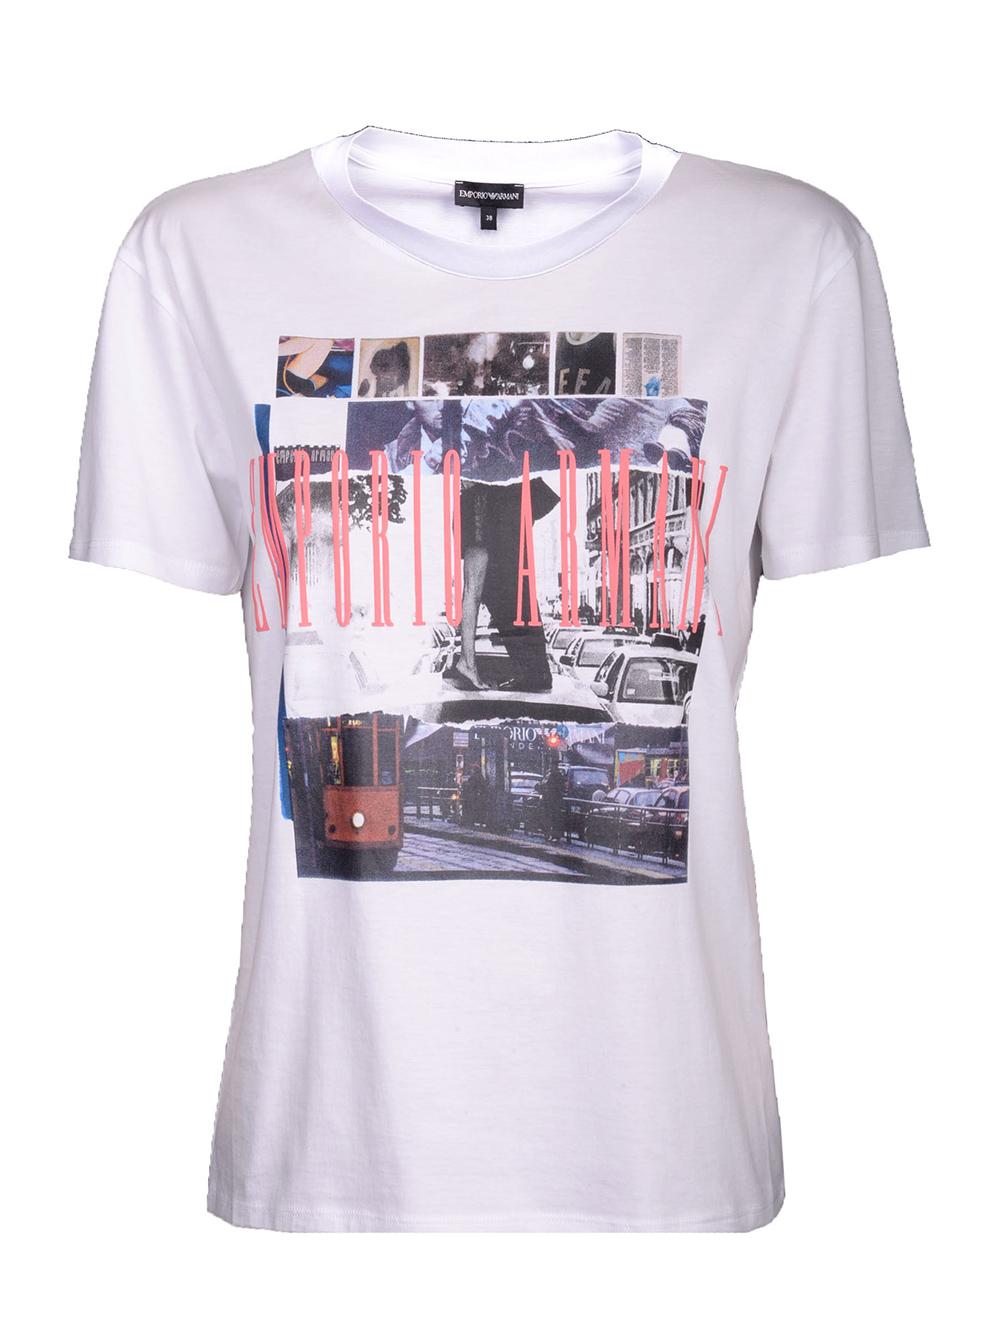 EMPORIO ARMANI Μπλούζα T-Shirt 3G2T87 2JSYZ ΛΕΥΚΟ